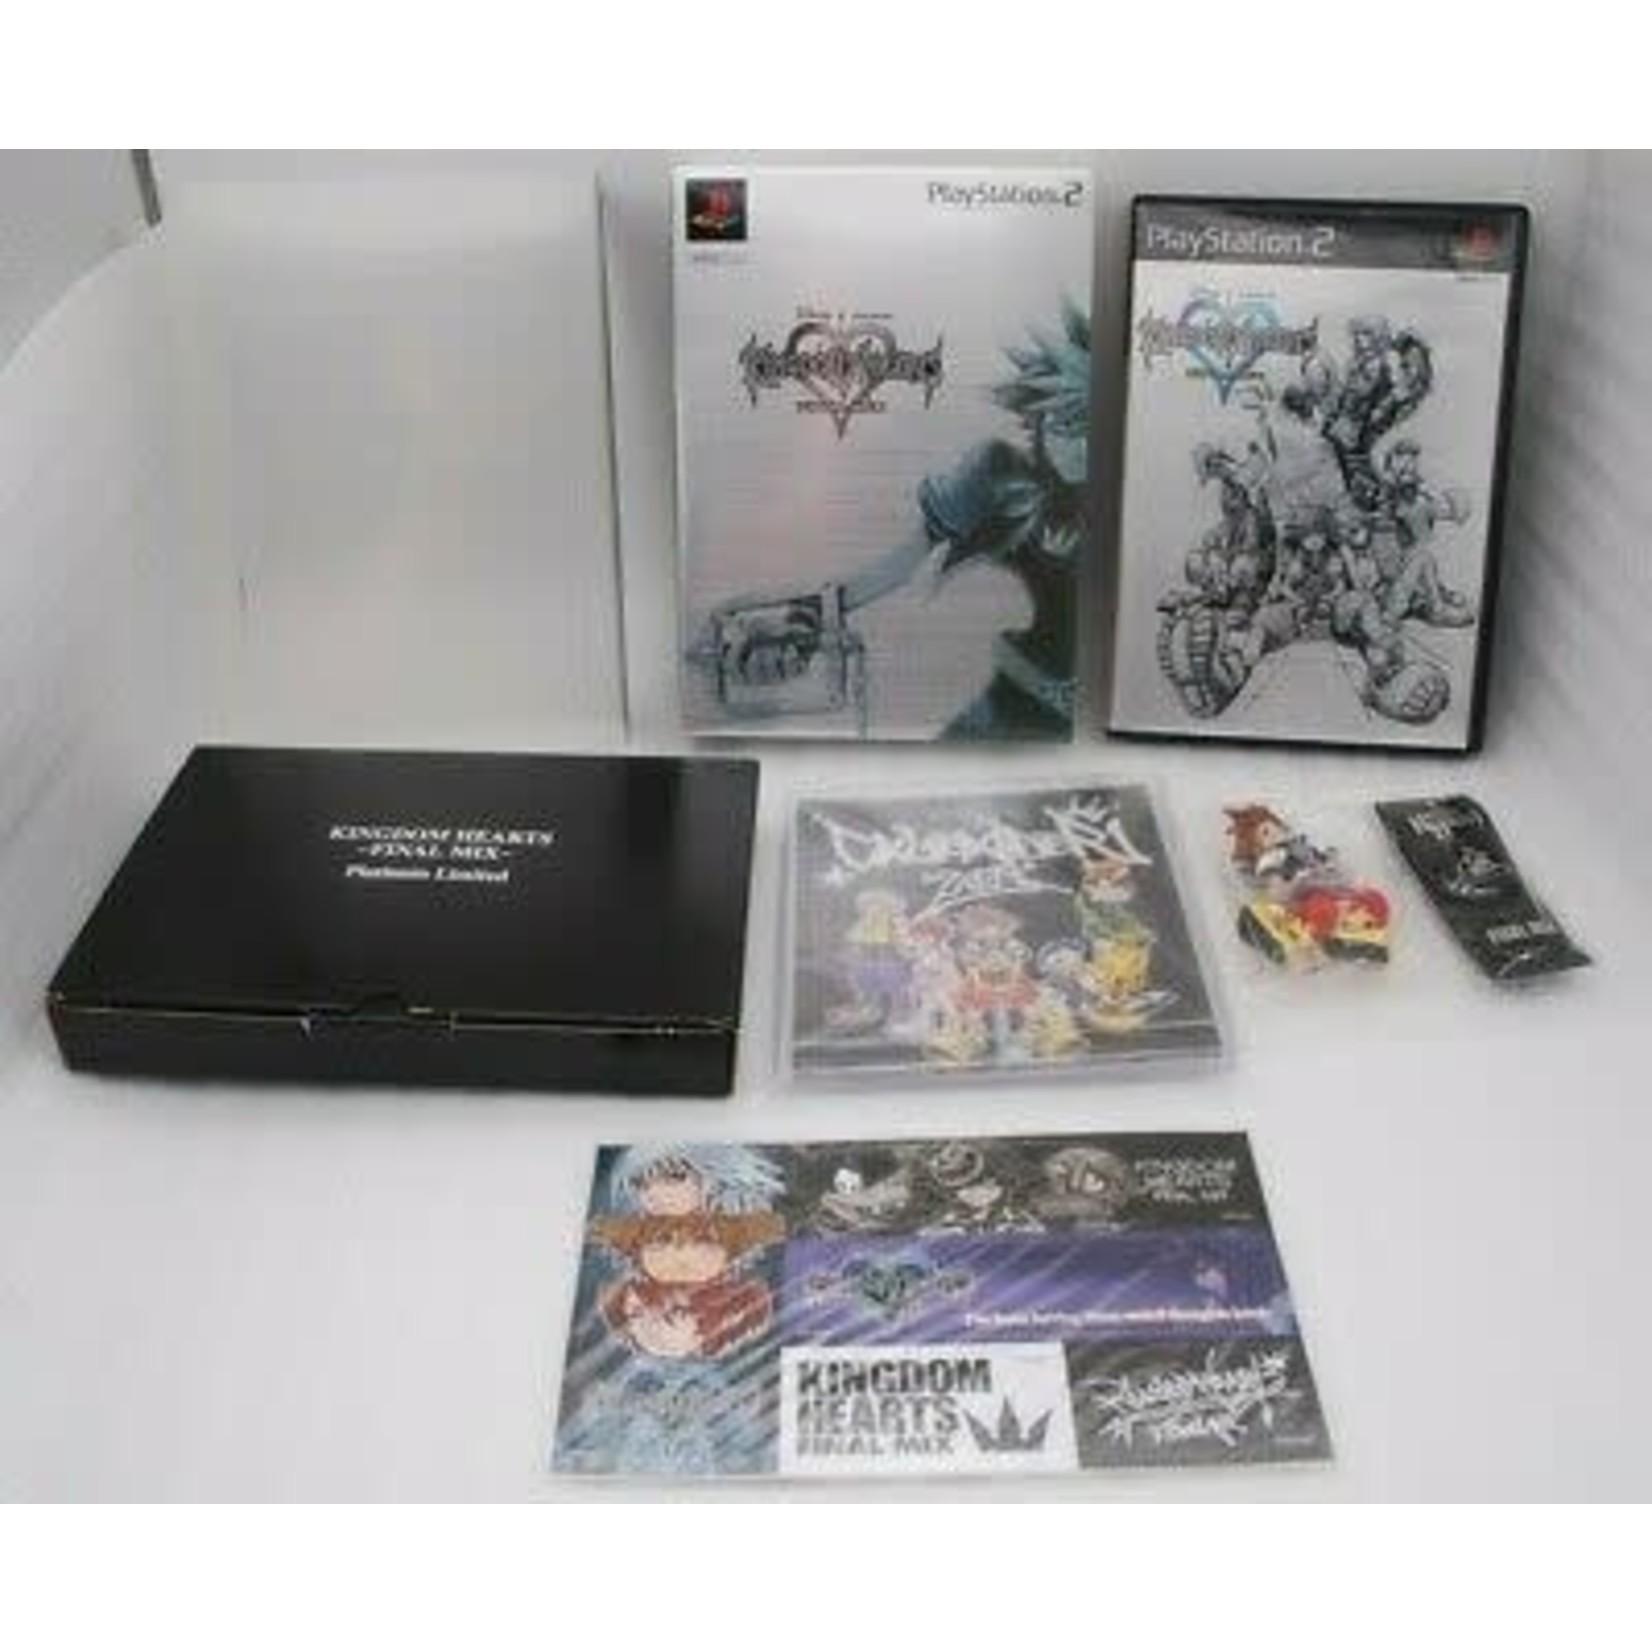 import-ps2u- Kingdom Hearts Final Mix Platinum Limited Edition